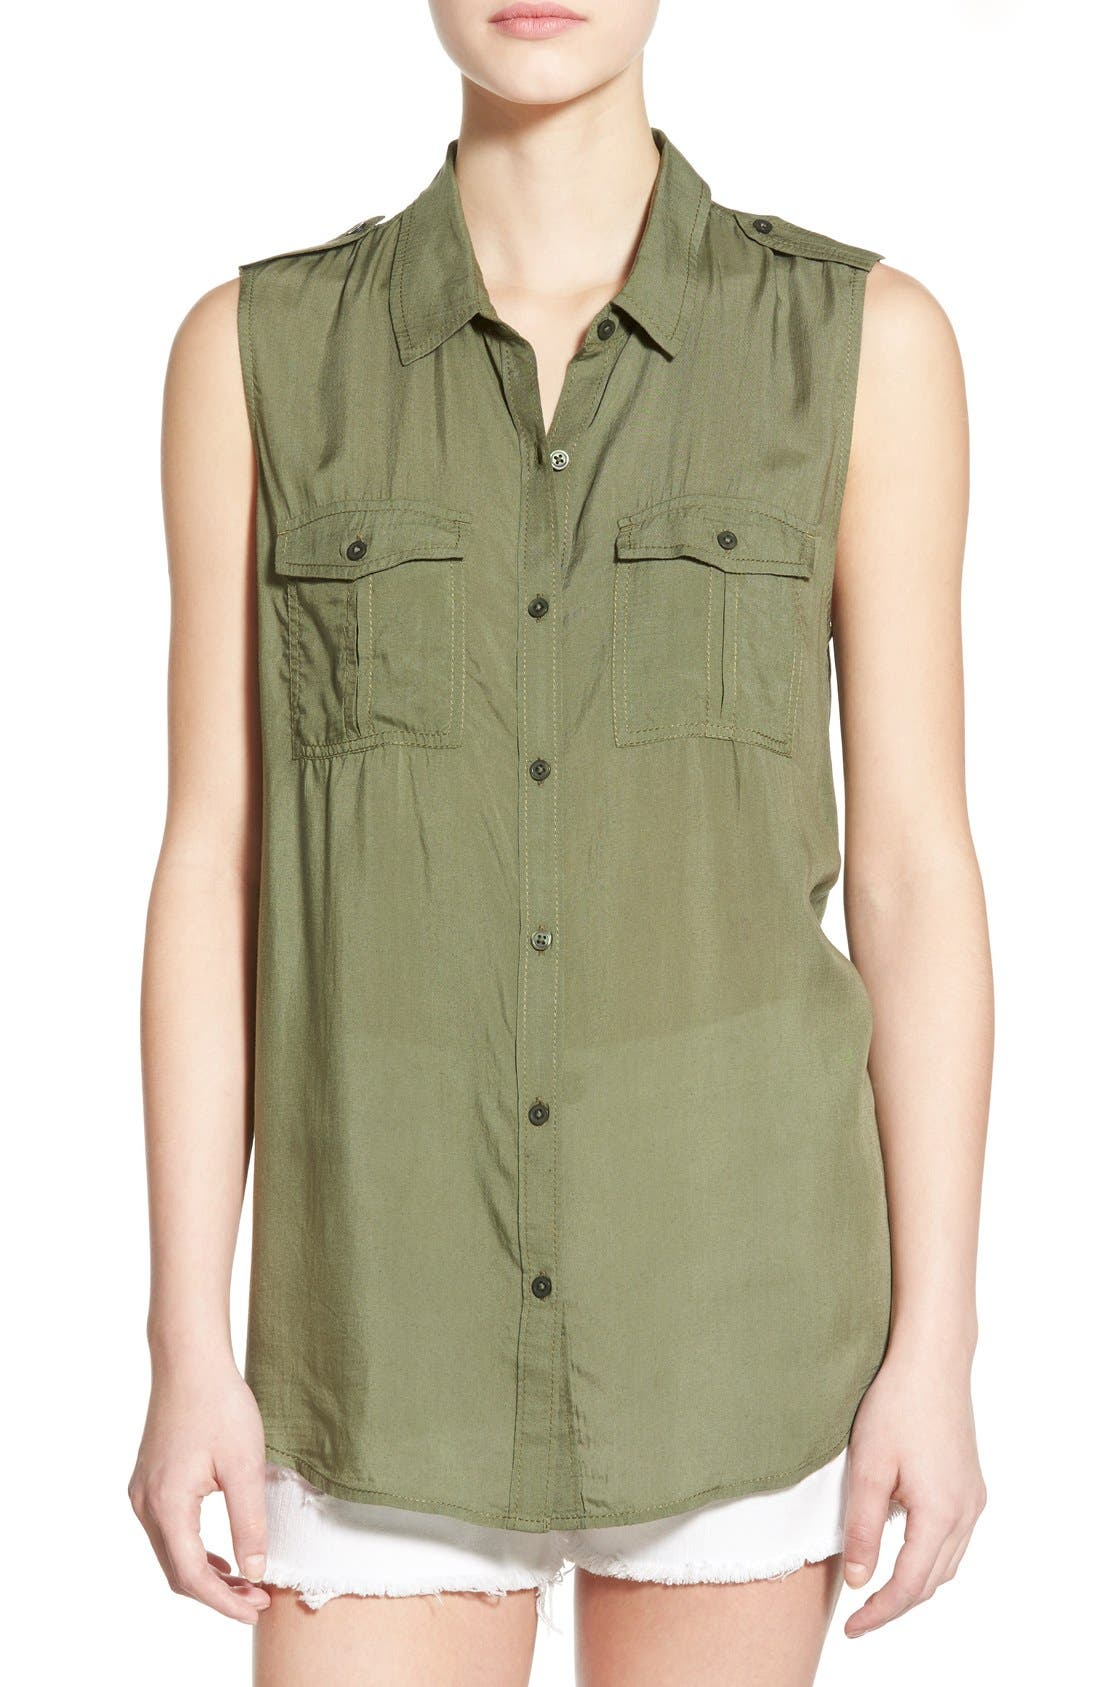 Alternate Image 1 Selected - BP. Sleeveless Safari Shirt